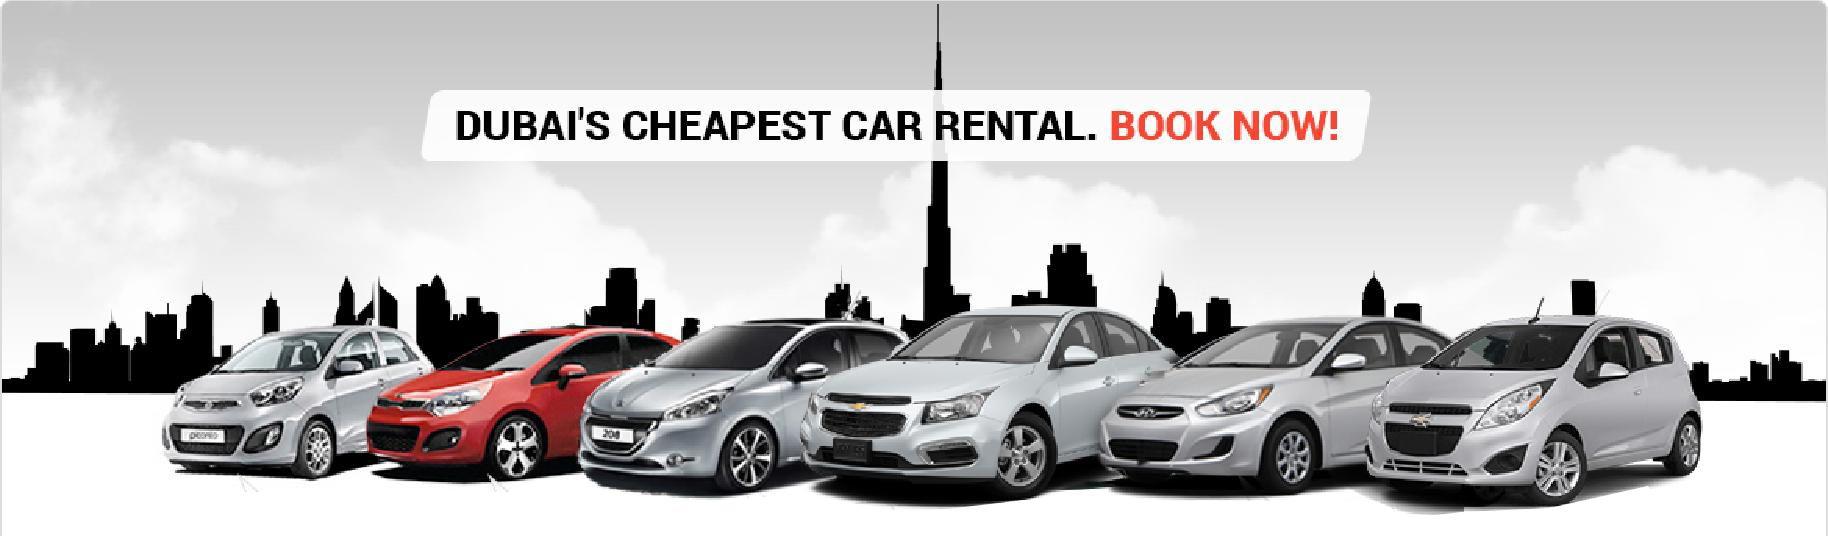 With Aaa Rent A Car Jlt Dubai You Get Cheap Rent A Car In Dubai